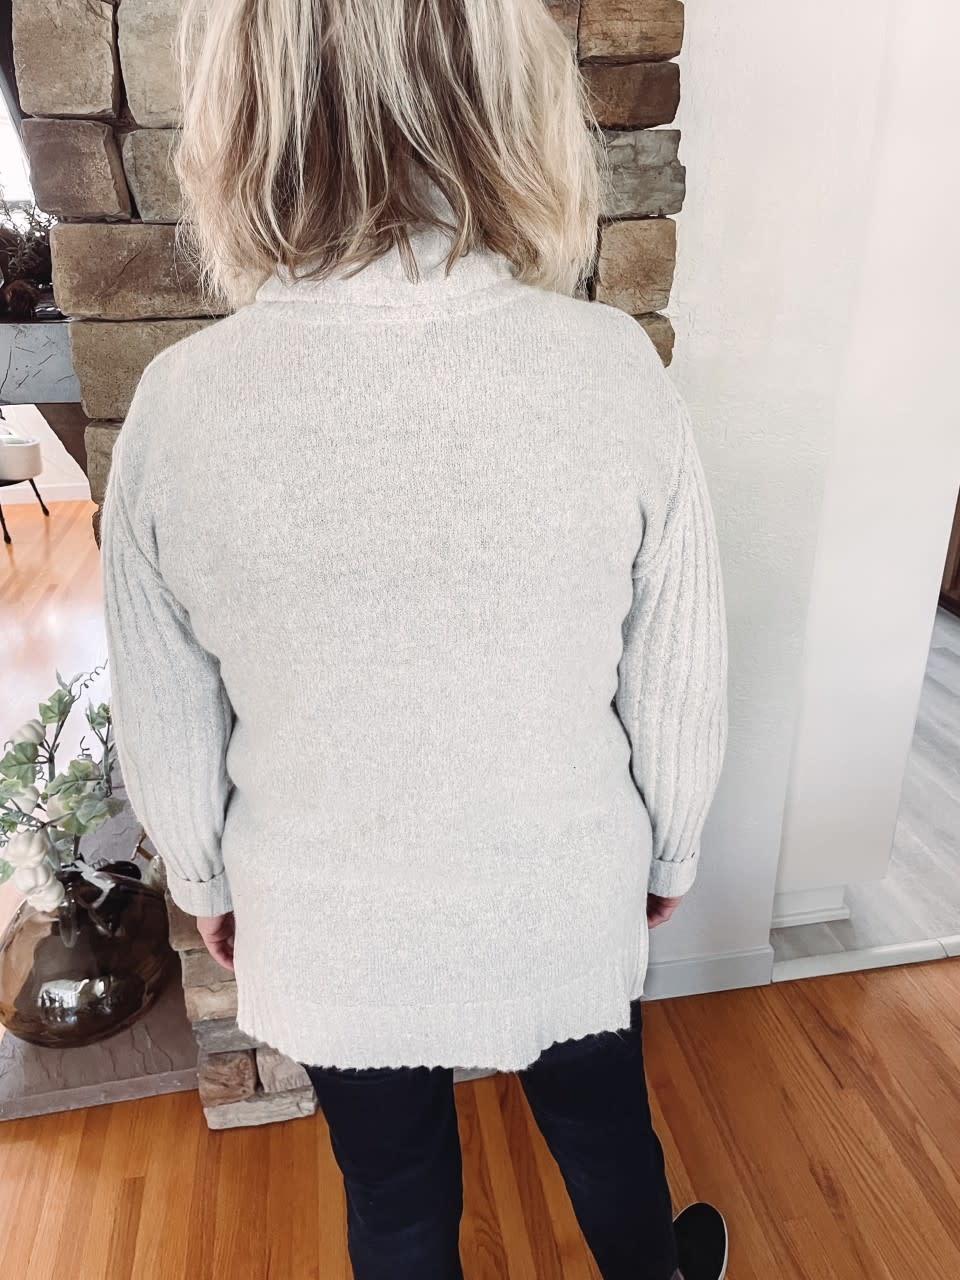 Chelsea Grey Turtleneck Sweater